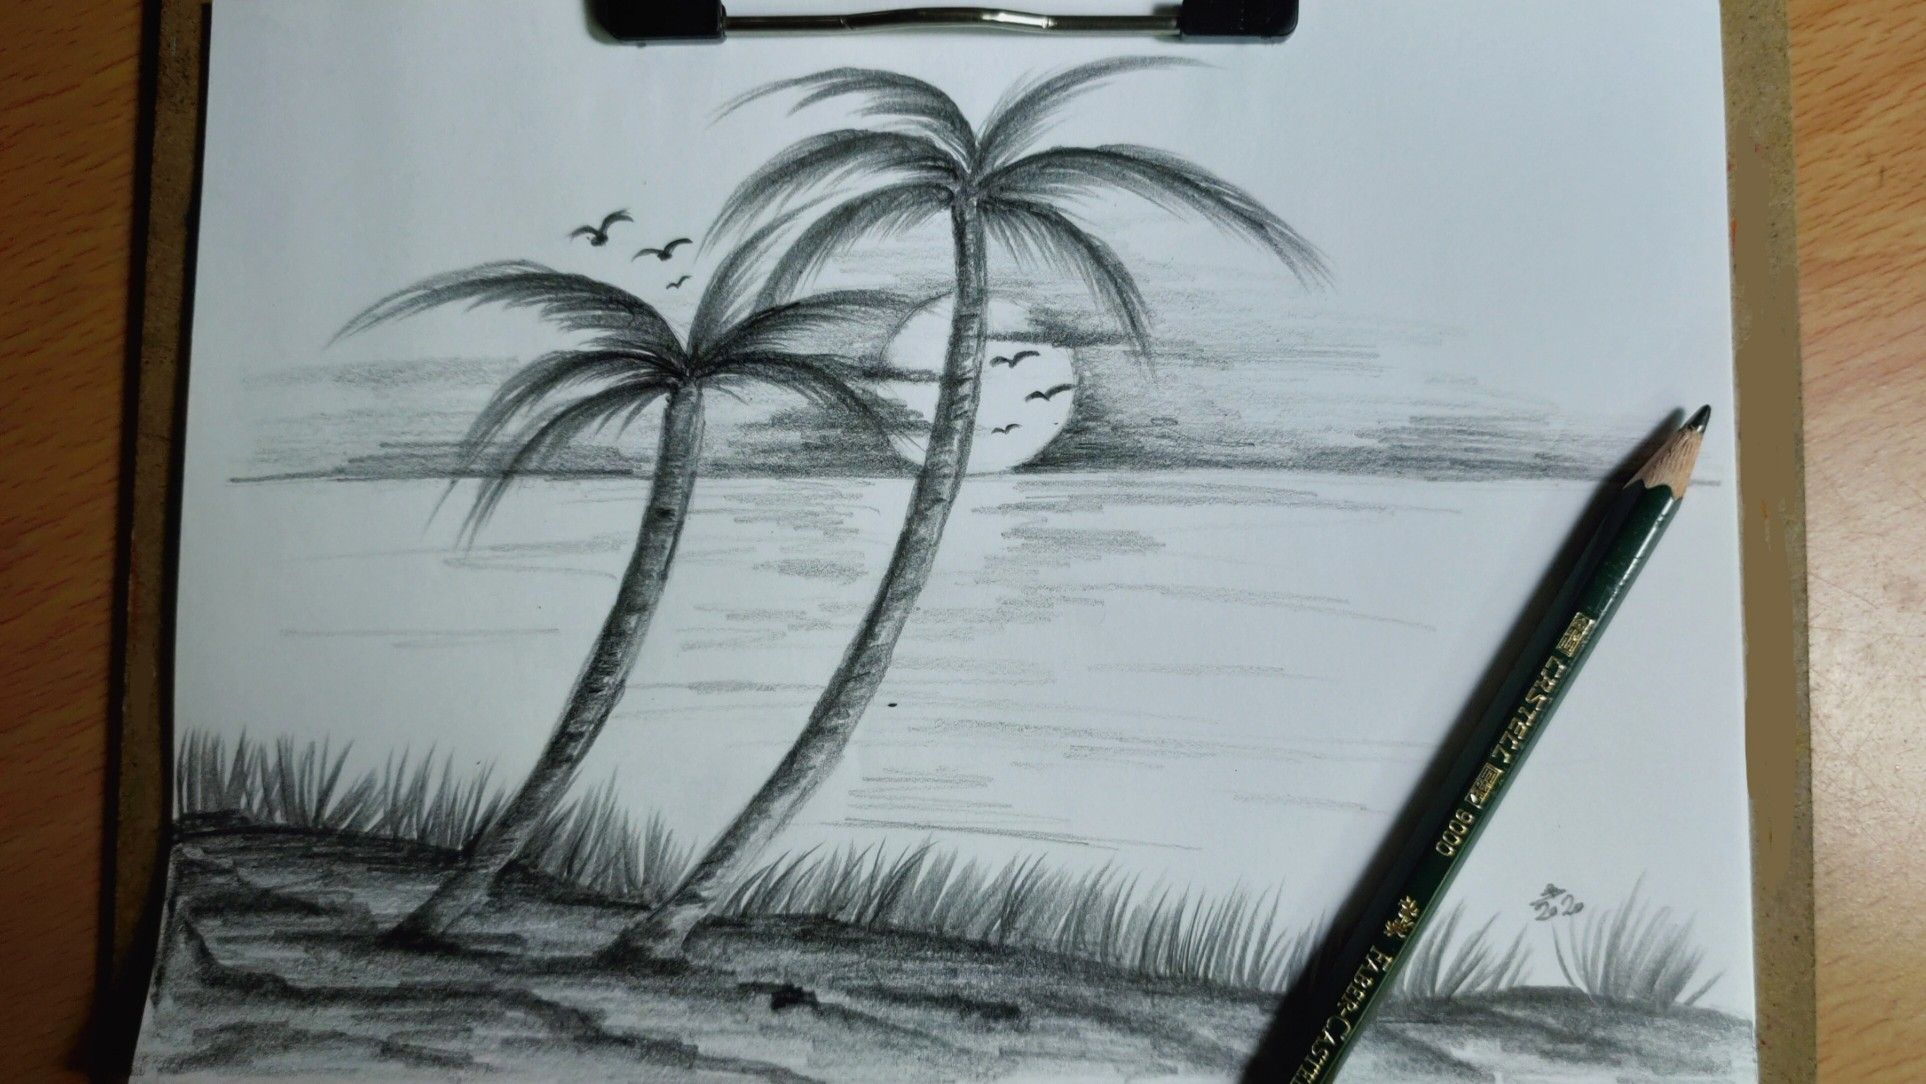 رسم مناظر طبيعيه بالرصاص مع الظل والنور Landscape Drawings Pencil Drawings Landscape